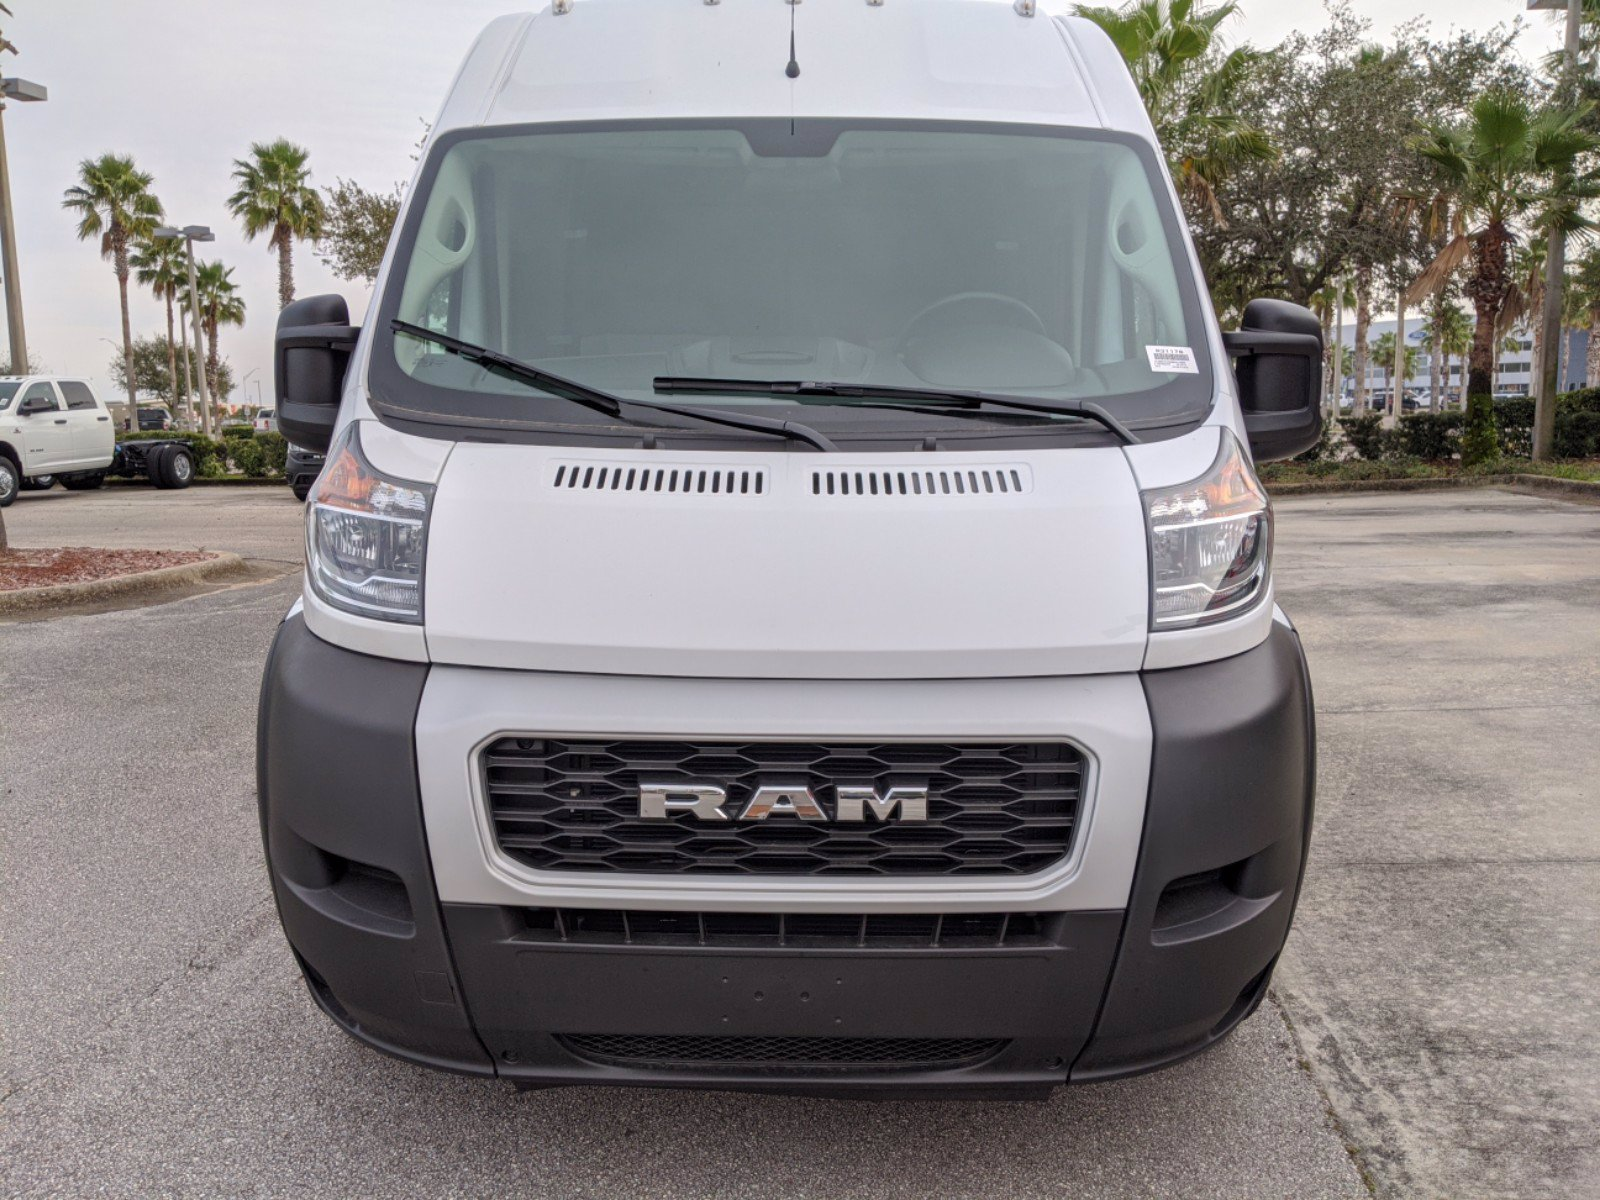 2021 Ram ProMaster 3500 FWD, Empty Cargo Van #R21178 - photo 7